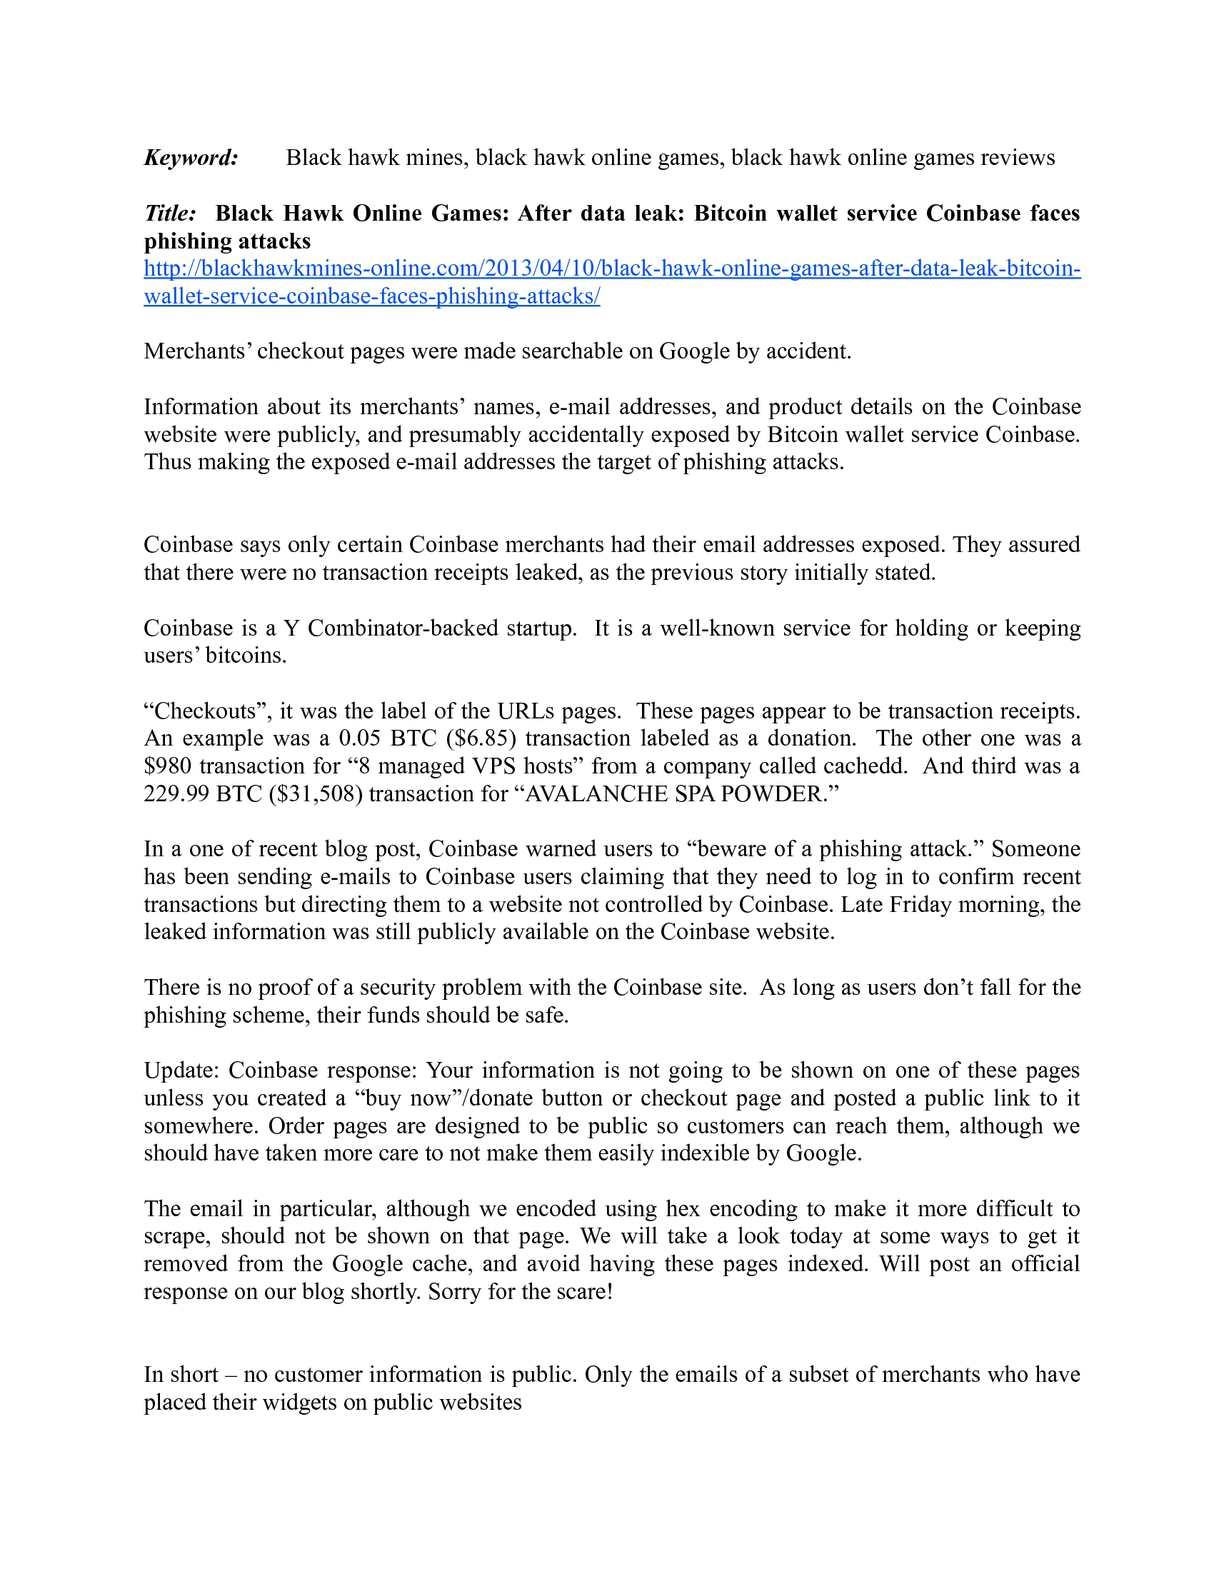 Calaméo - Black Hawk Online Games: After data leak: Bitcoin